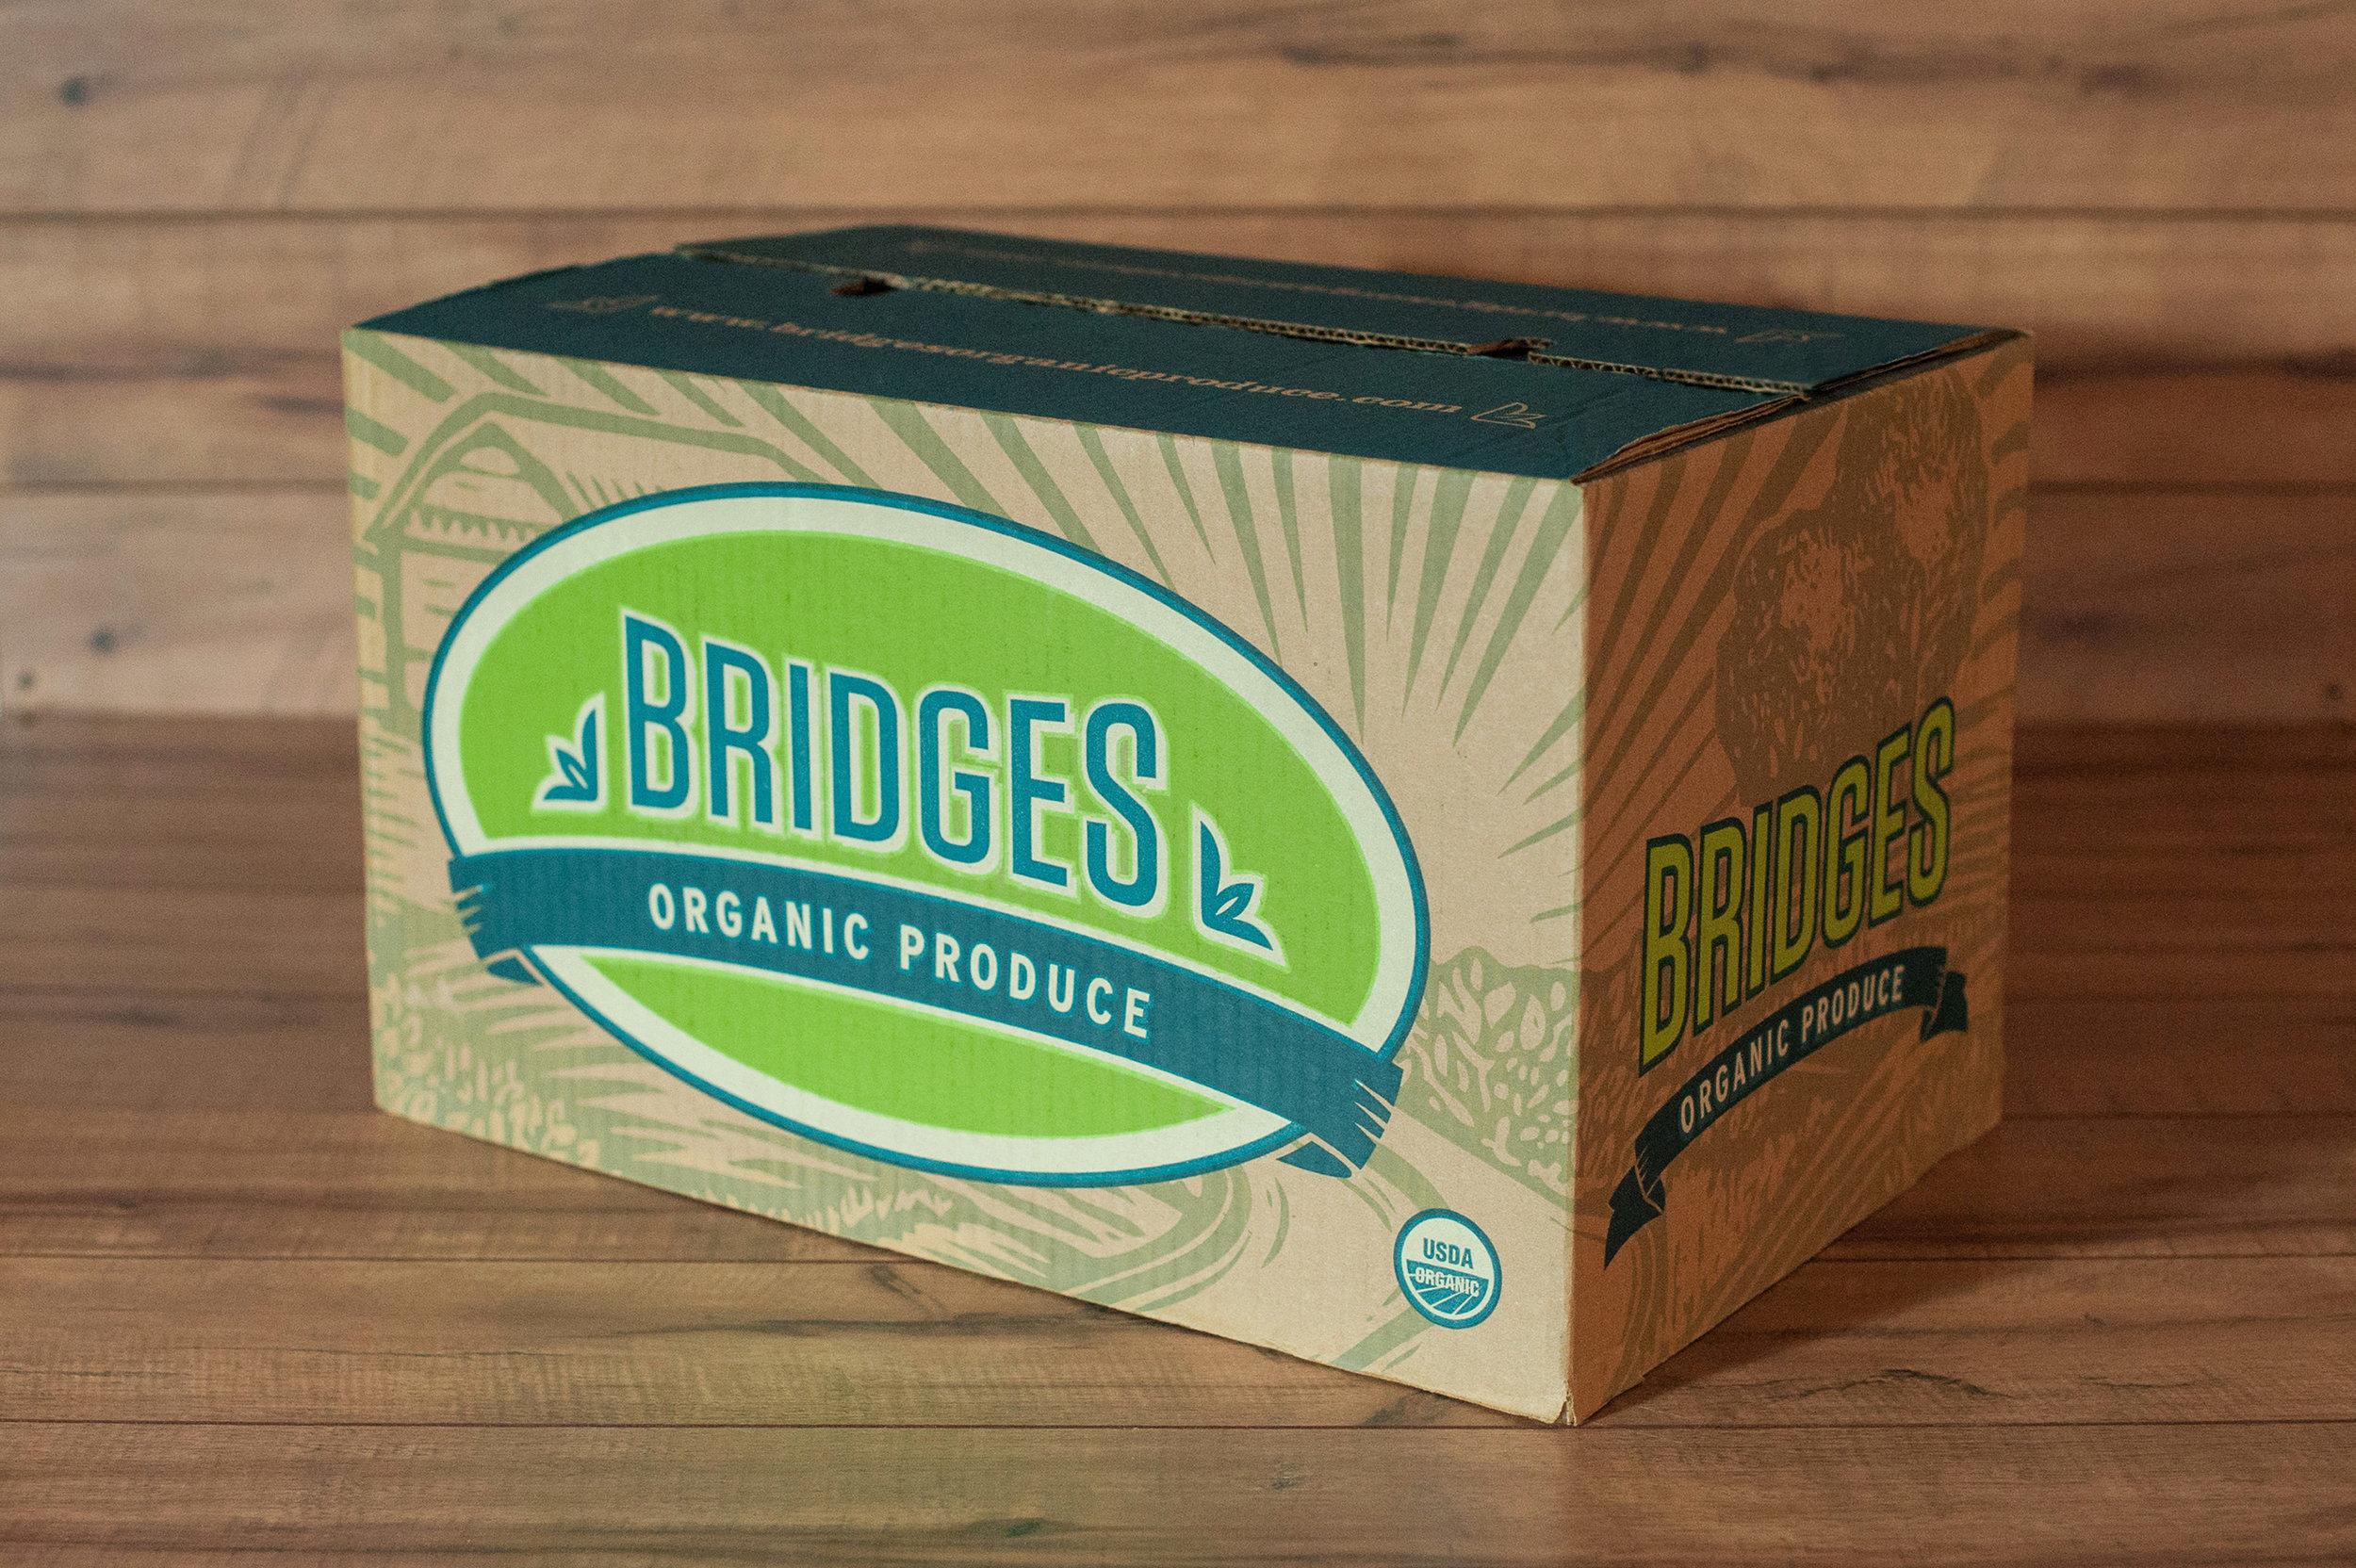 Bridges Organic Produce -